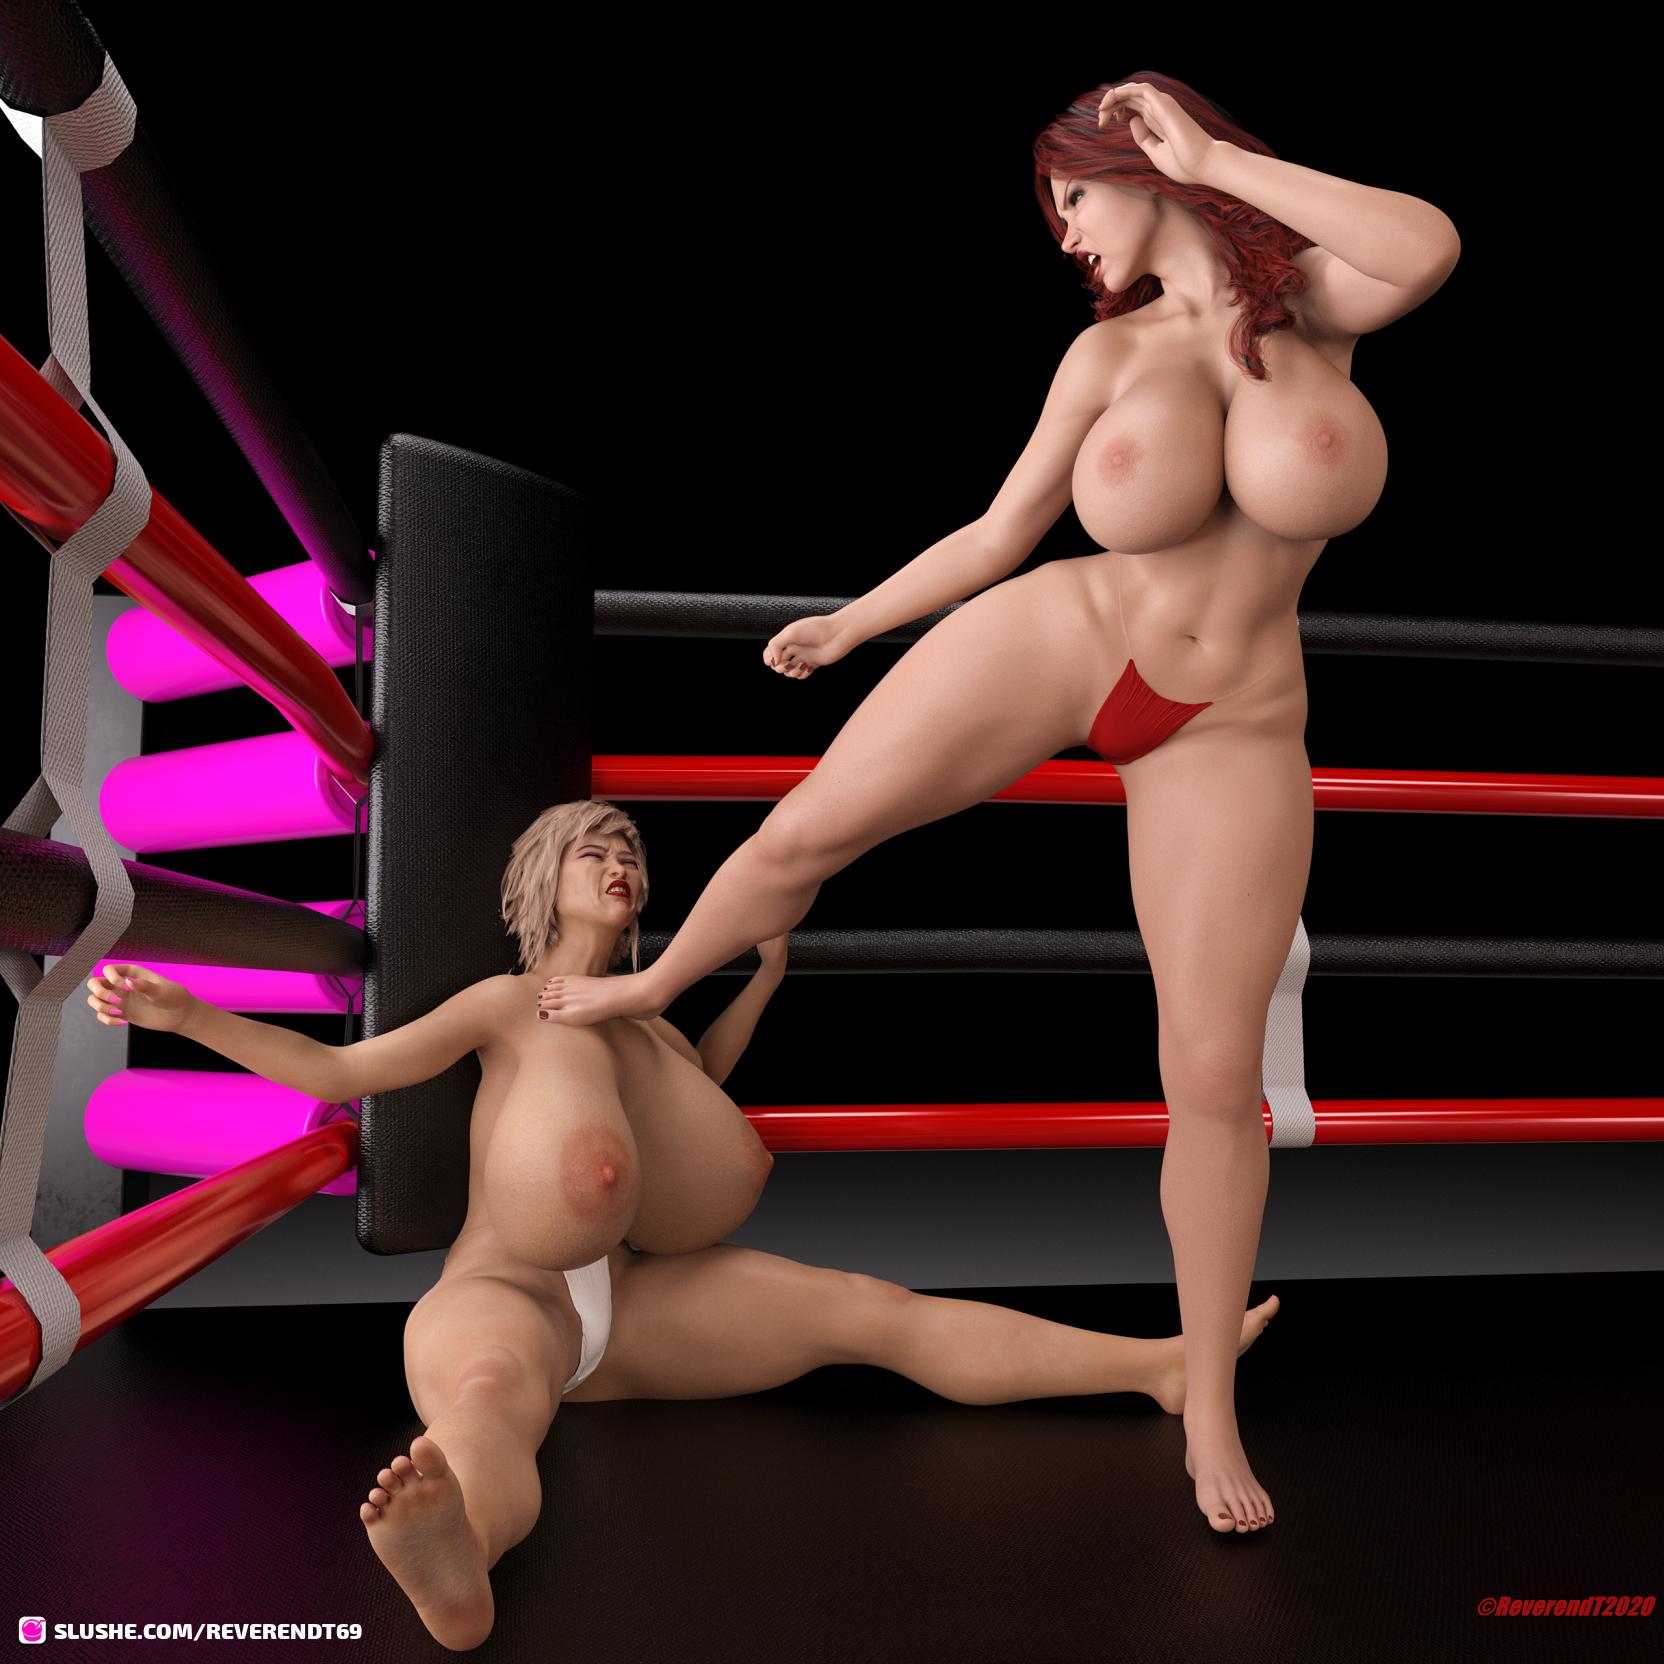 Wrestle request